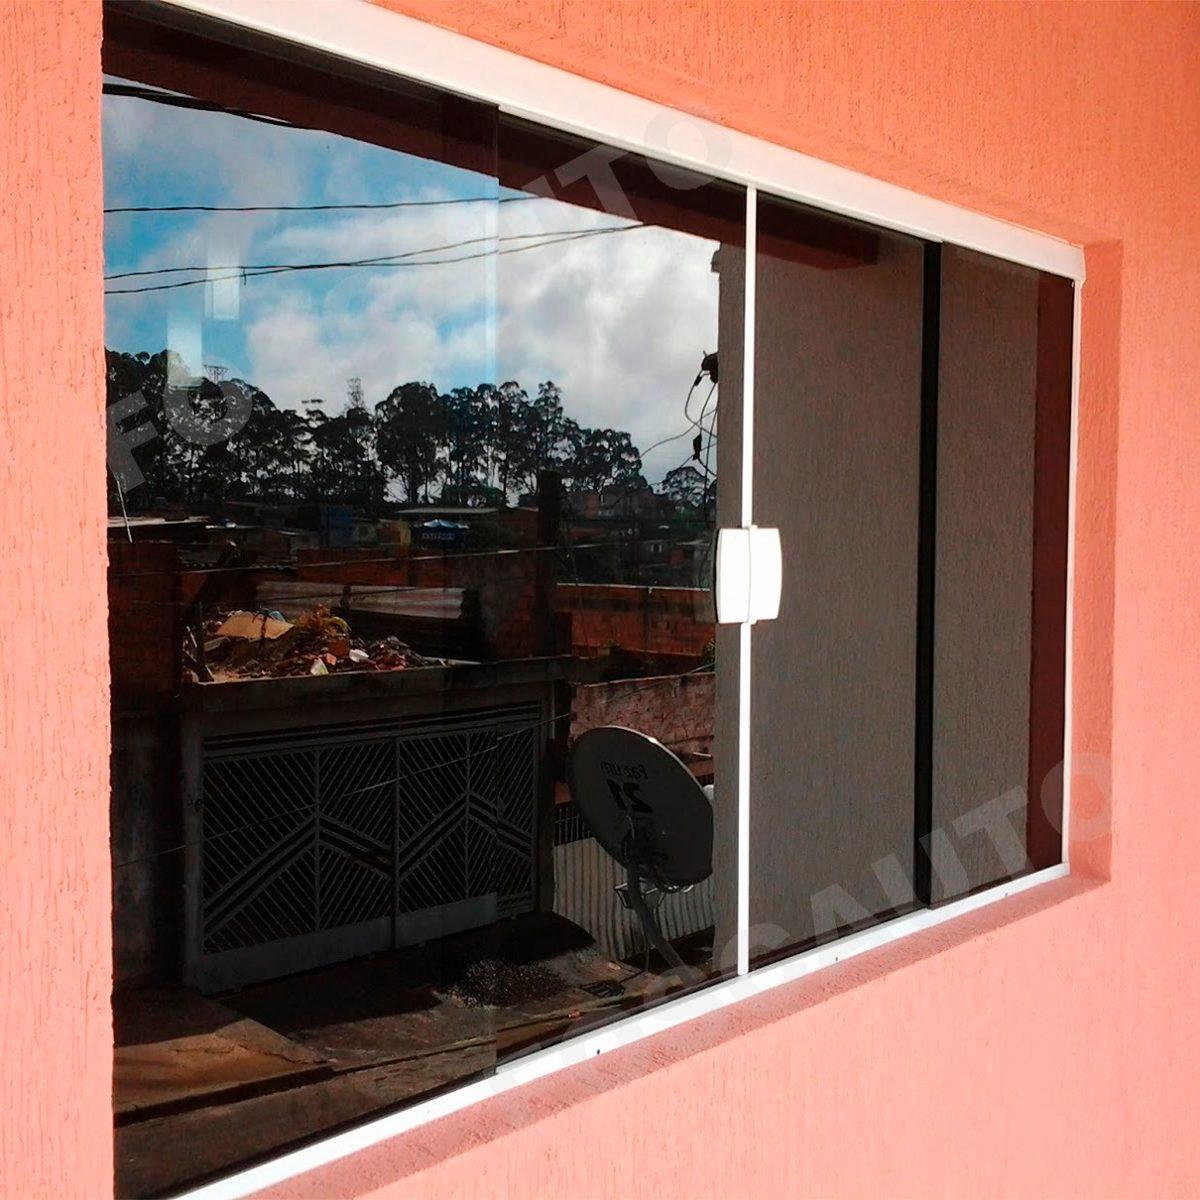 #C72804 Preto Fume Porta Janela Vidro Blindex R$ 19 95 em Mercado Livre 230 Janelas De Vidro Para Quarto Mercado Livre